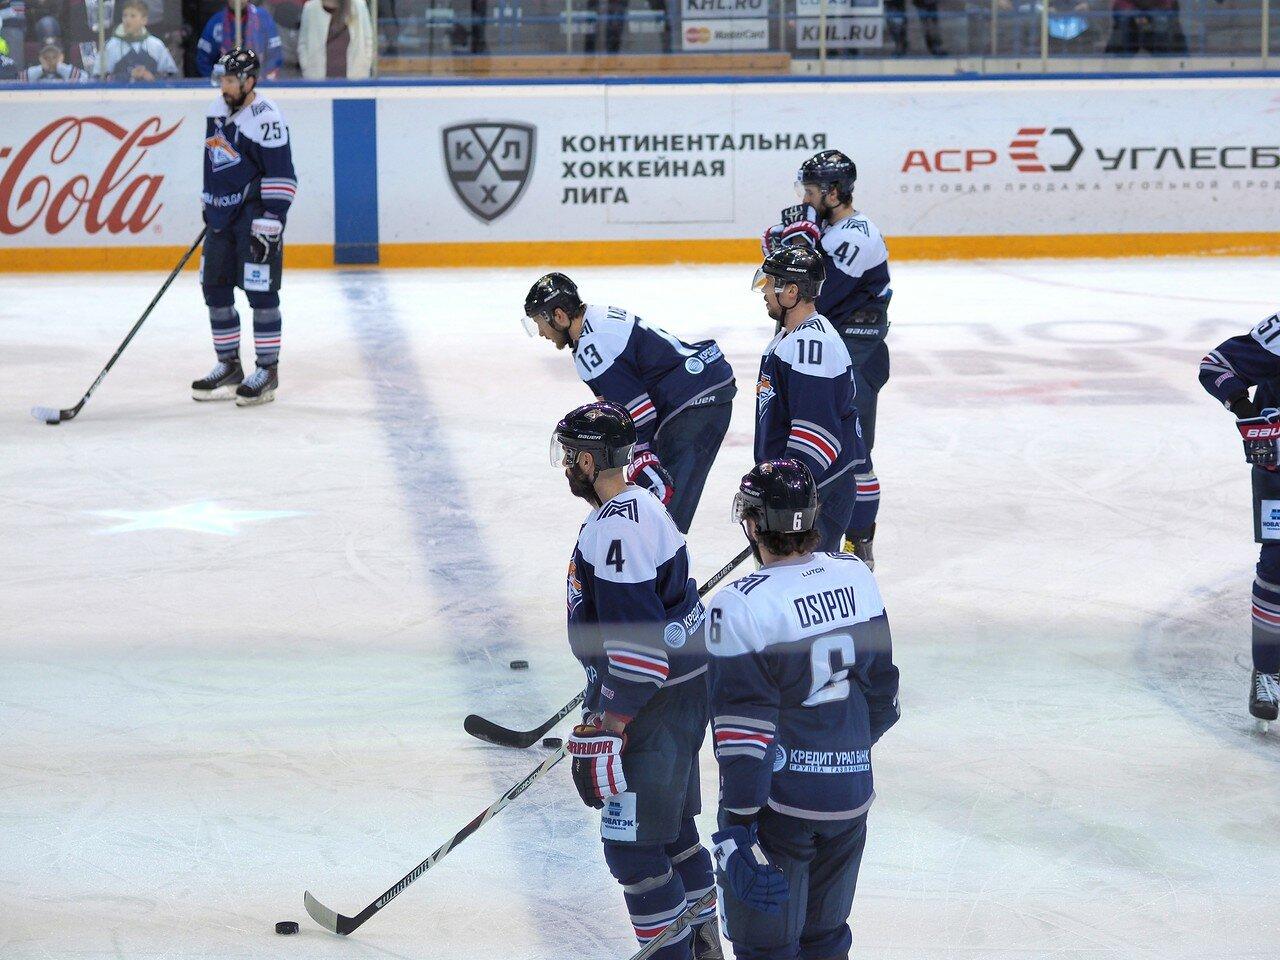 19Плей-офф 2016 Восток Финал Металлург - Салават Юлаев 31.03.2016